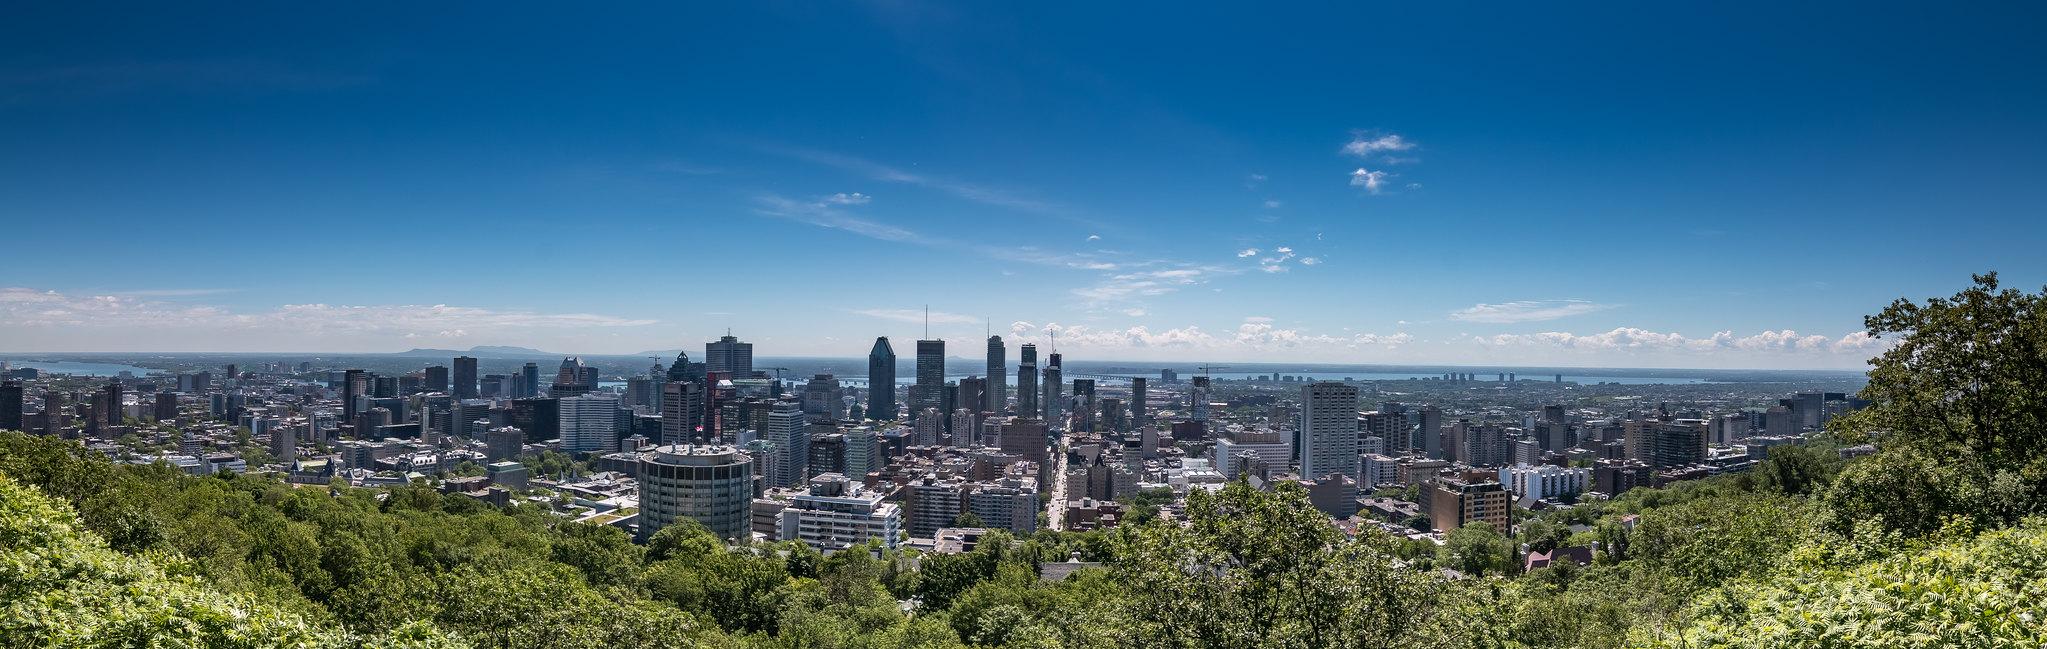 Montréal - Québec - [Canada]